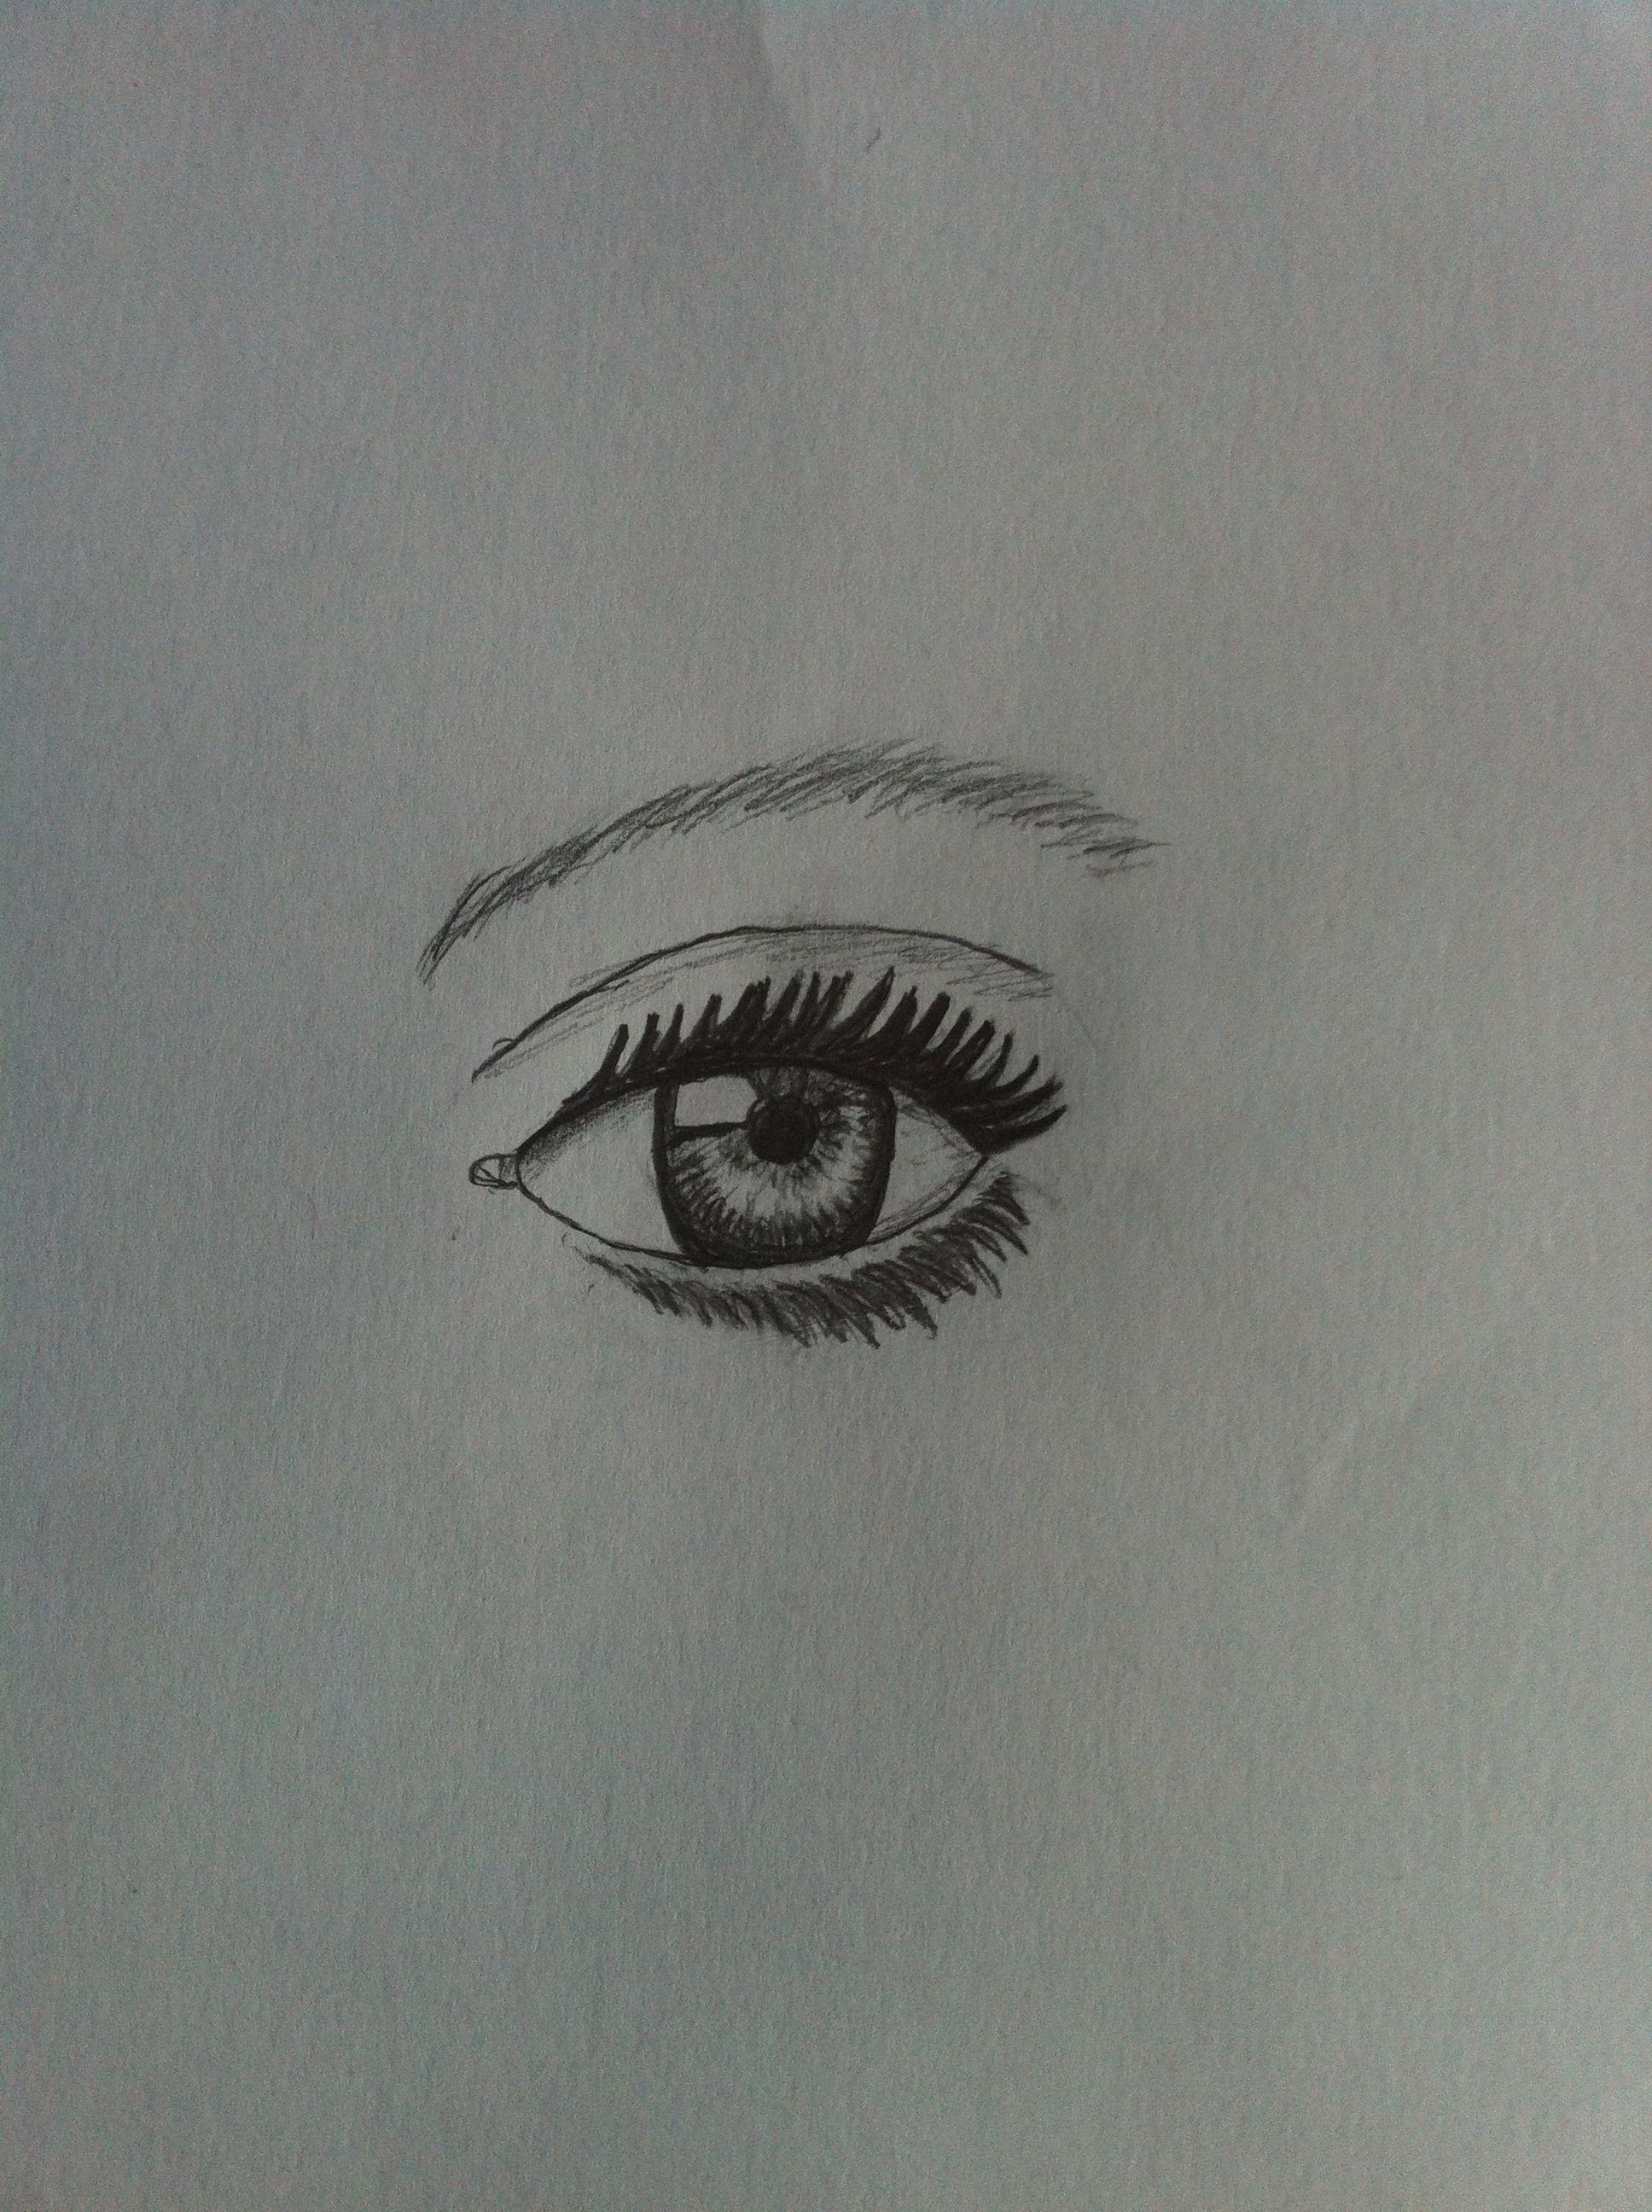 Just drew this eye!!!